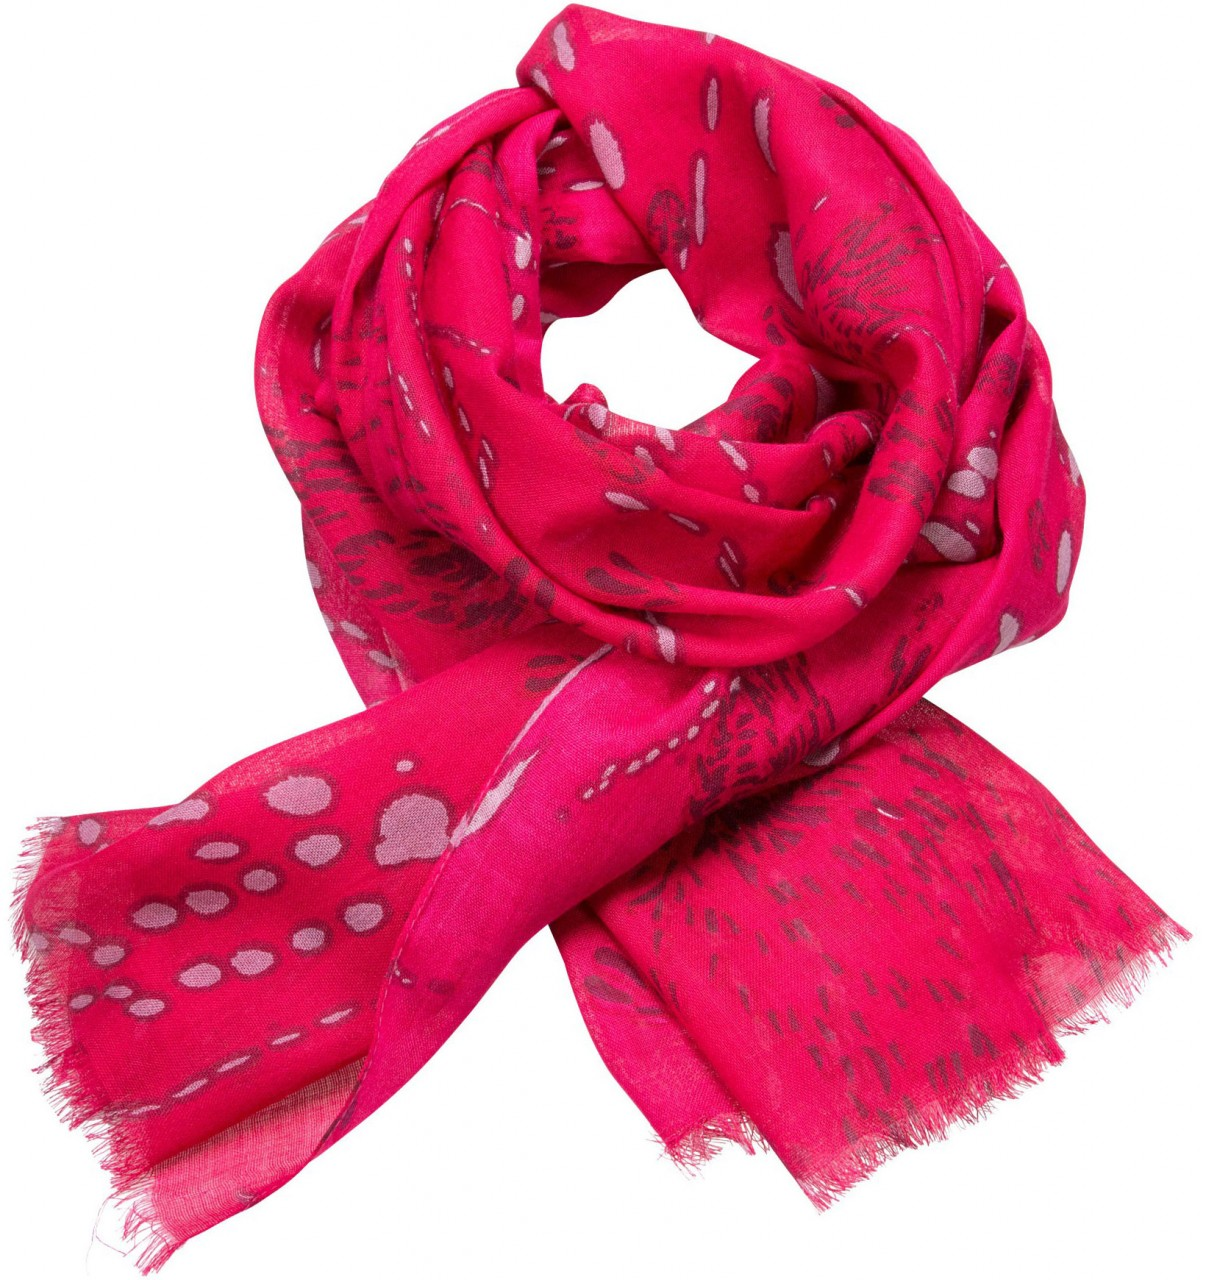 Trachtenschal Schneespuren pink